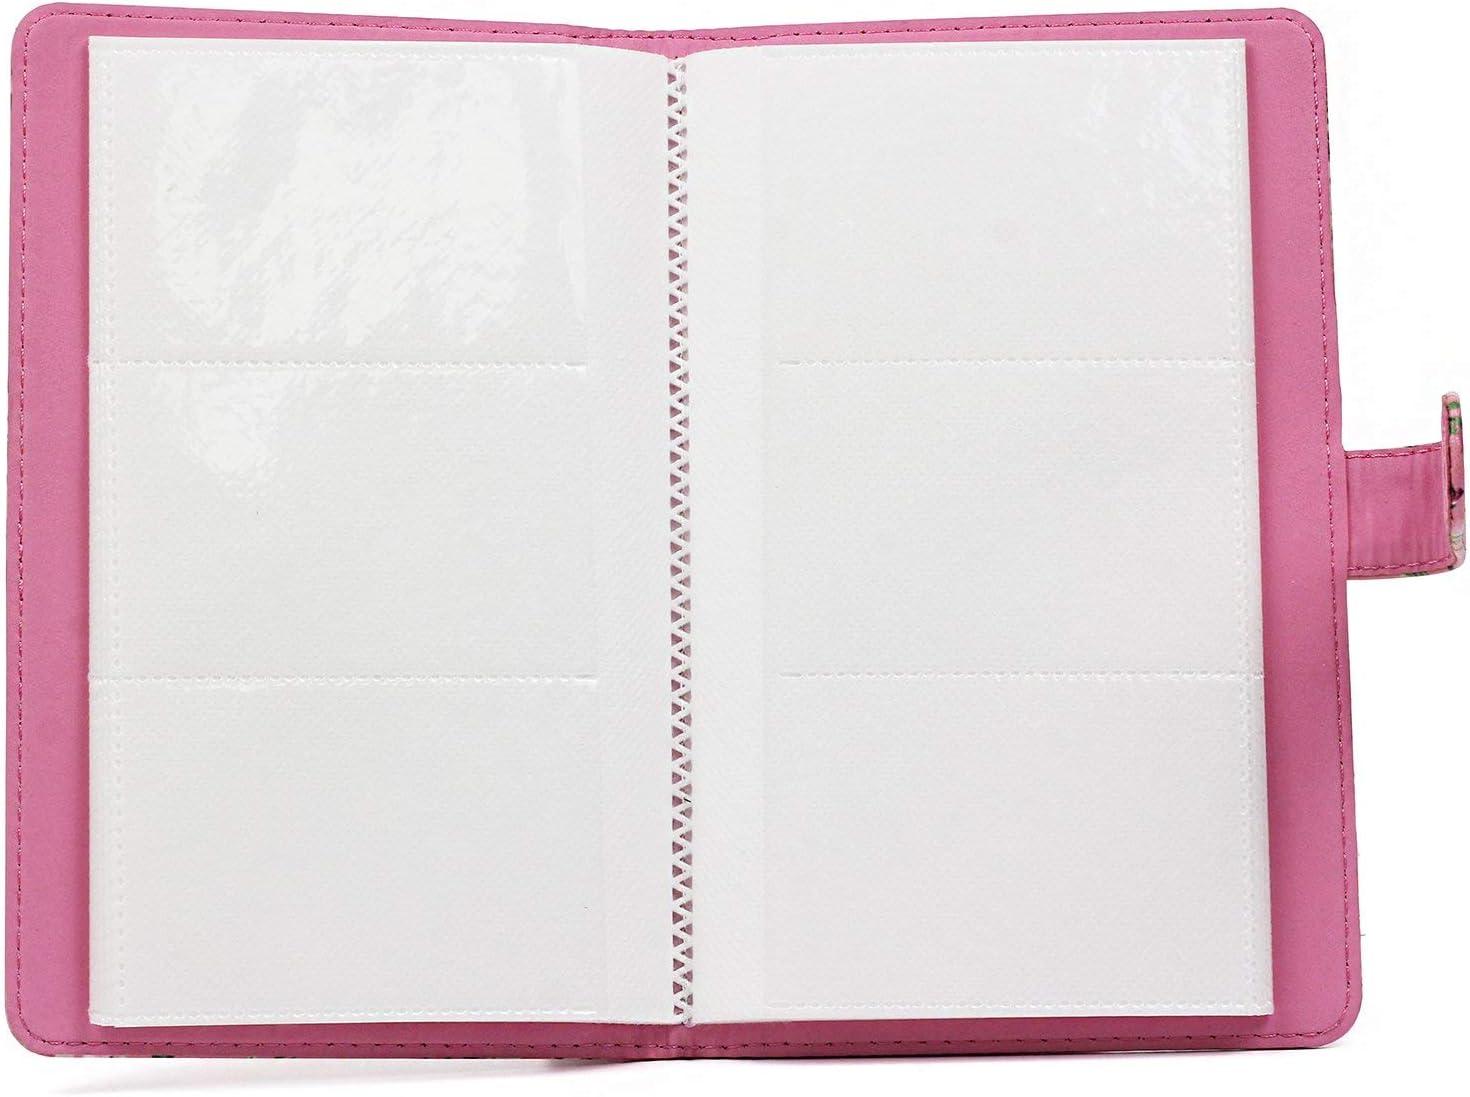 Z-SHINE 96 Pockets Wallet Photo Album for Fujifilm Instax Mini LiPlay 11 9 8 7s 90 25 70 for Polaroid Z2300 PIC-300P 96 Pockets, Blue Share SP-2 Mini Link Printer